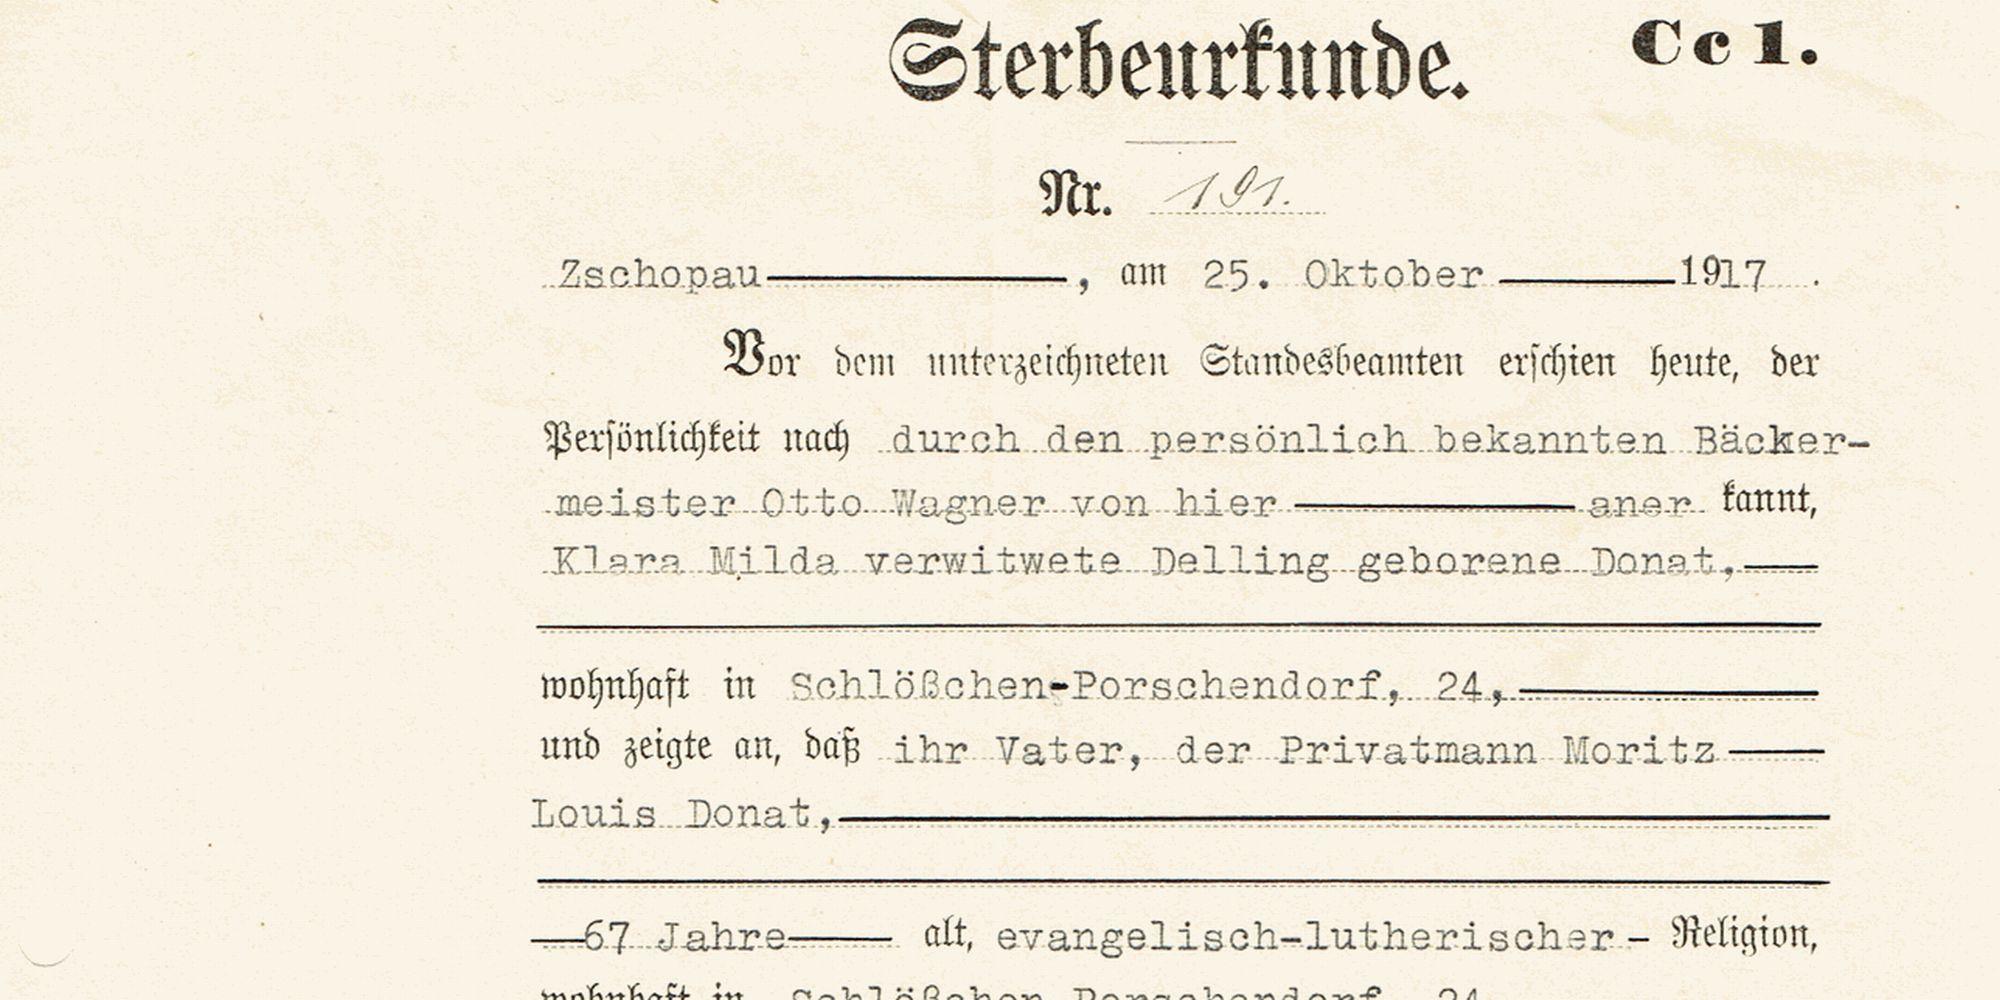 ahnenforschung genealogie sterbeurkunde dilibra -